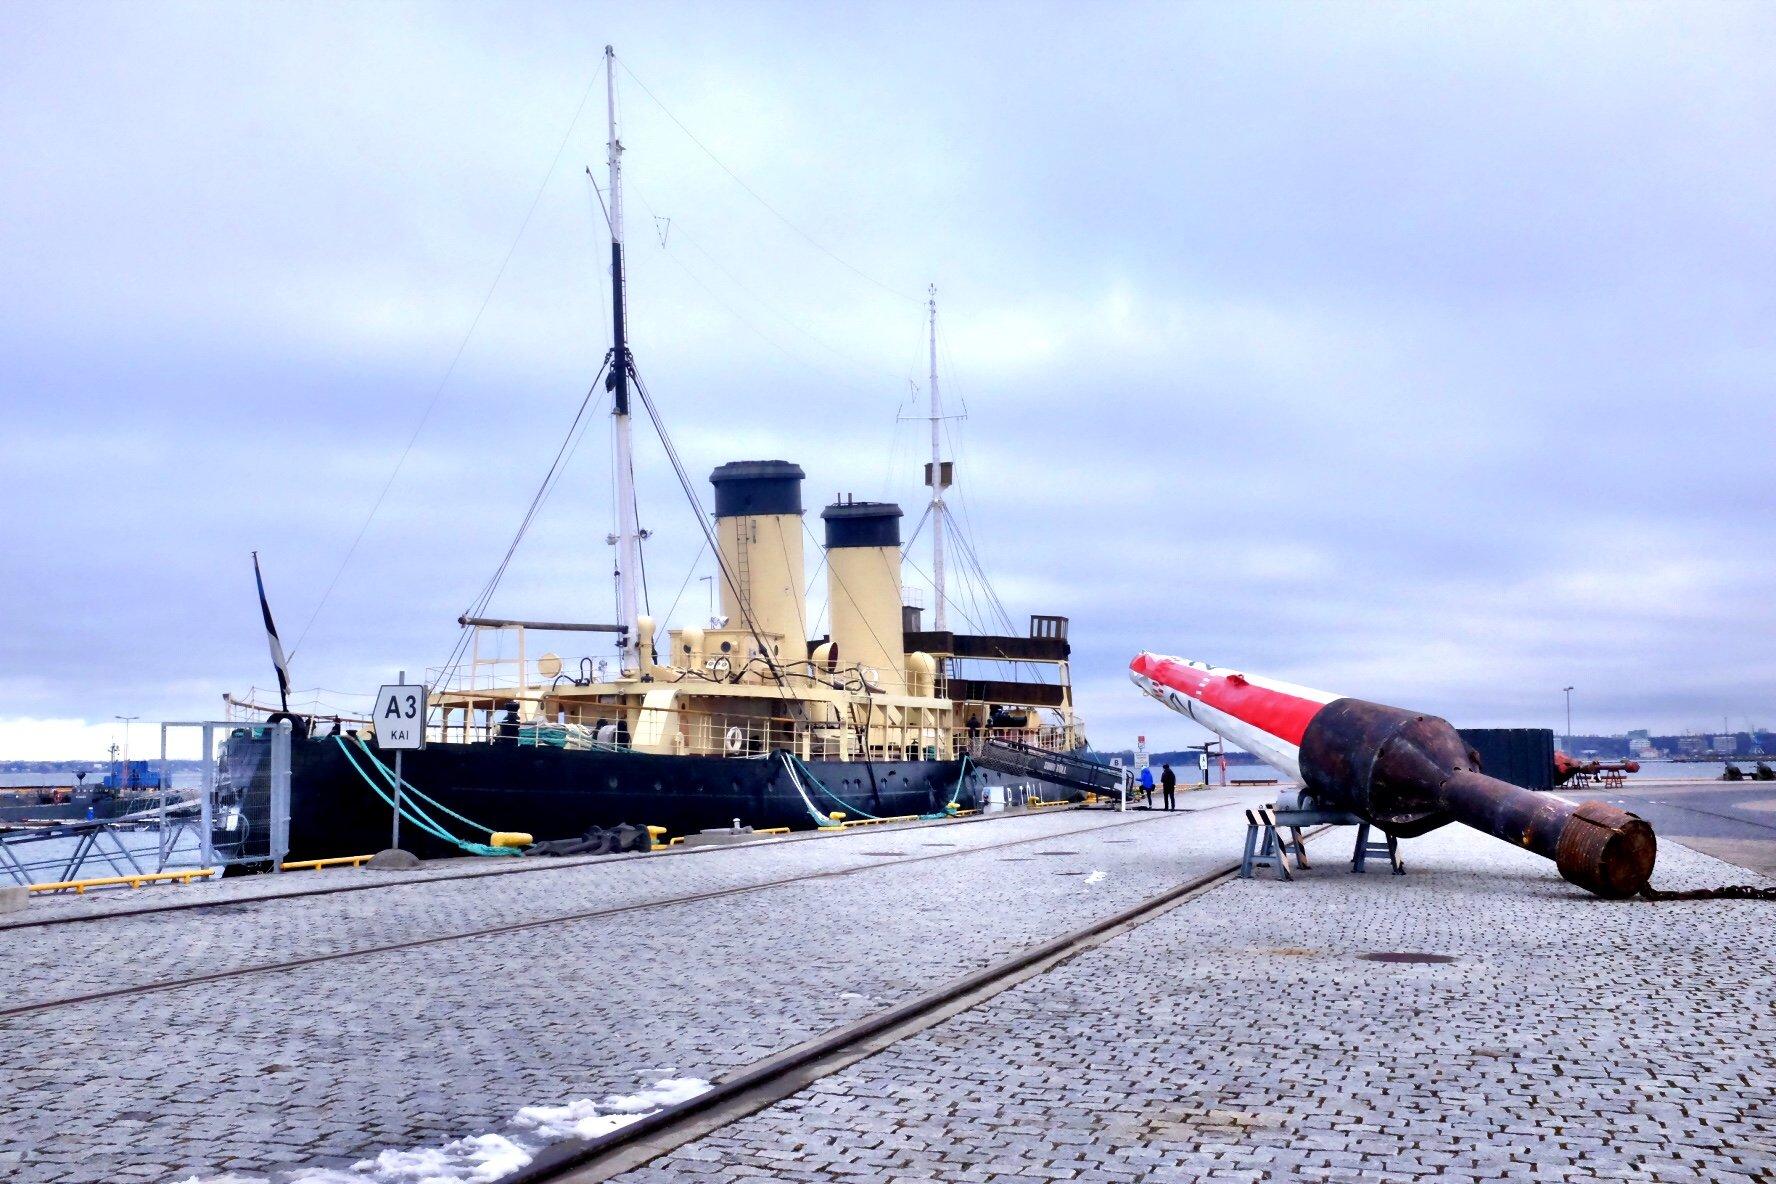 Icebreaker with boye exhibited at the Seaplane Museum in Tallinn